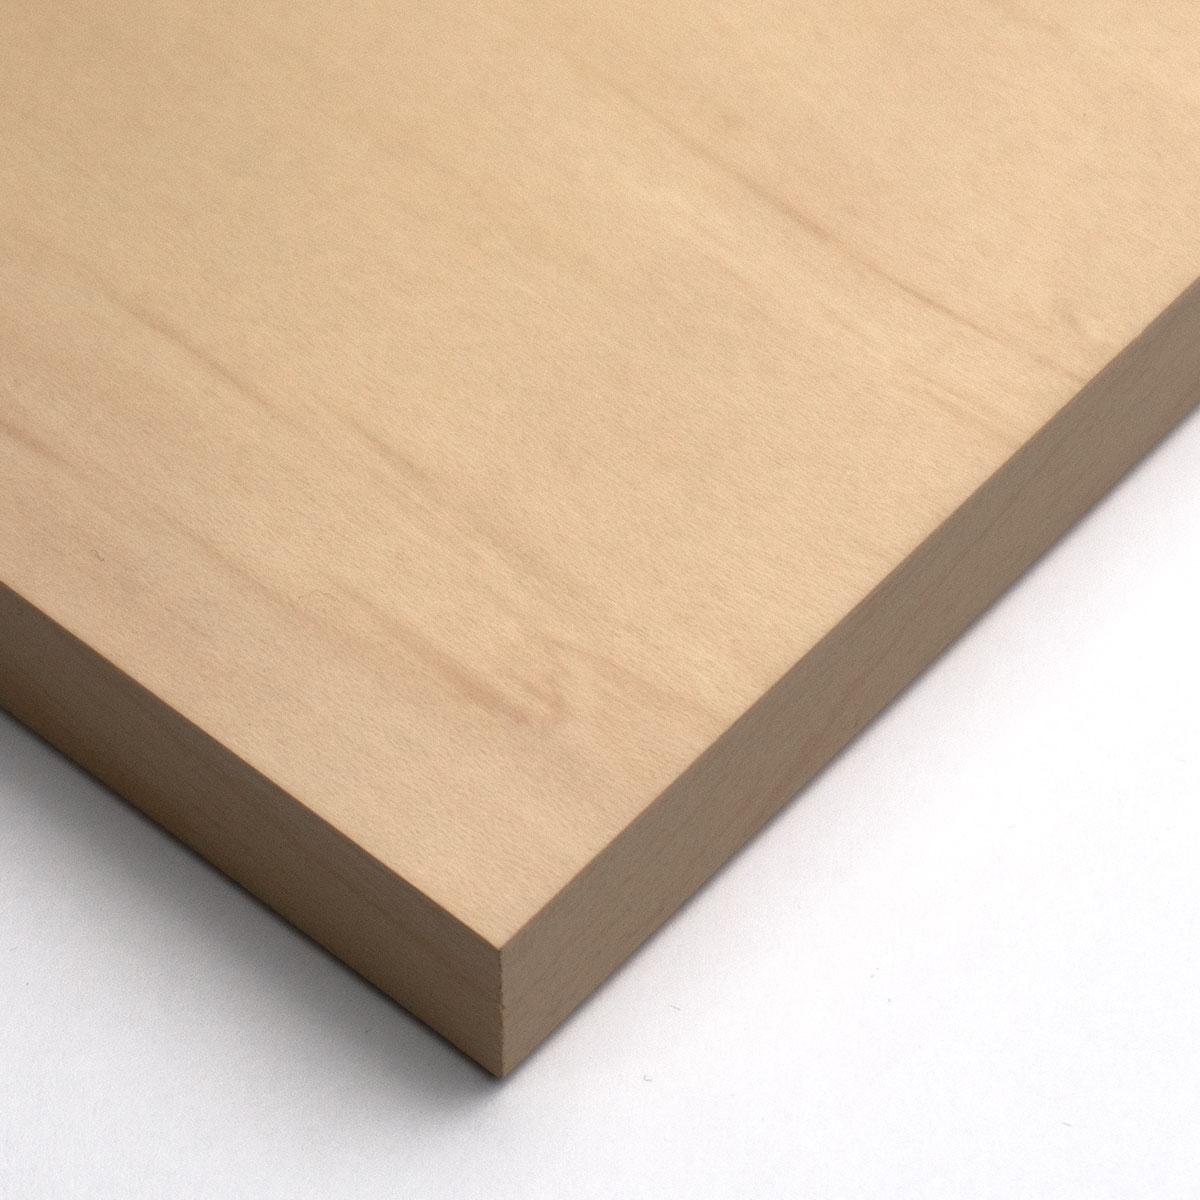 Chromaluxe Wood Panel